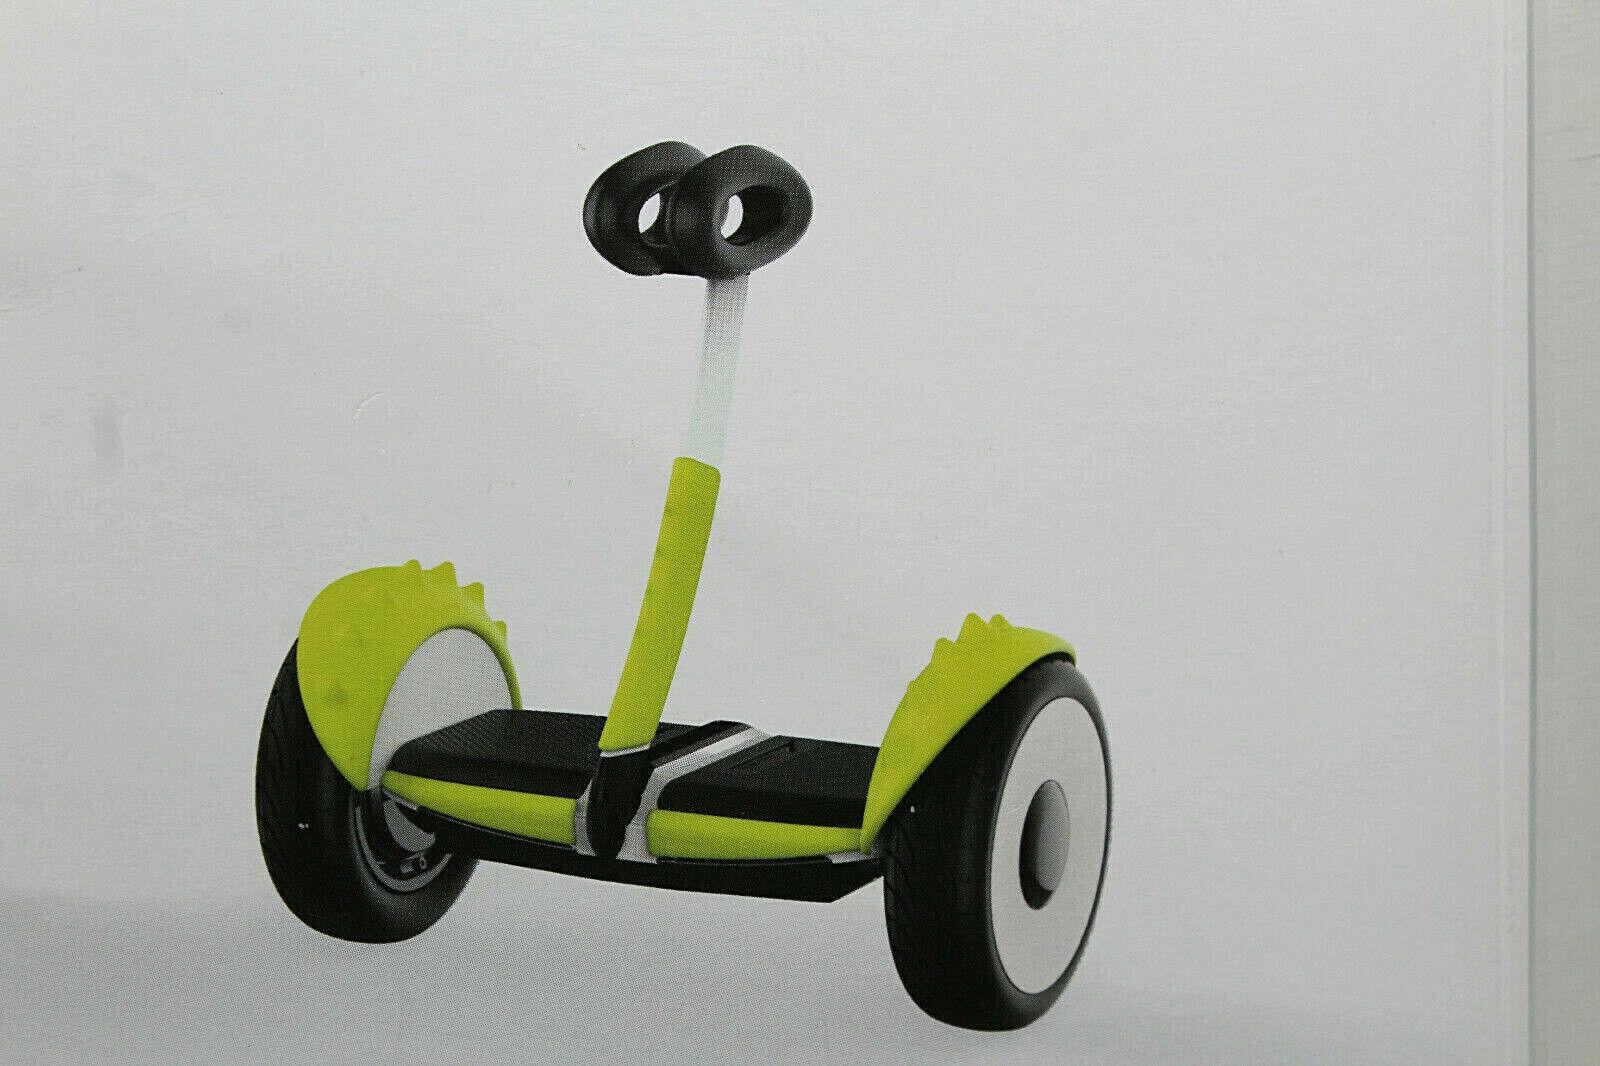 Segway Bumper Kit grün 55617 6+ Rollerzubehör NEU NEU NEU 659675